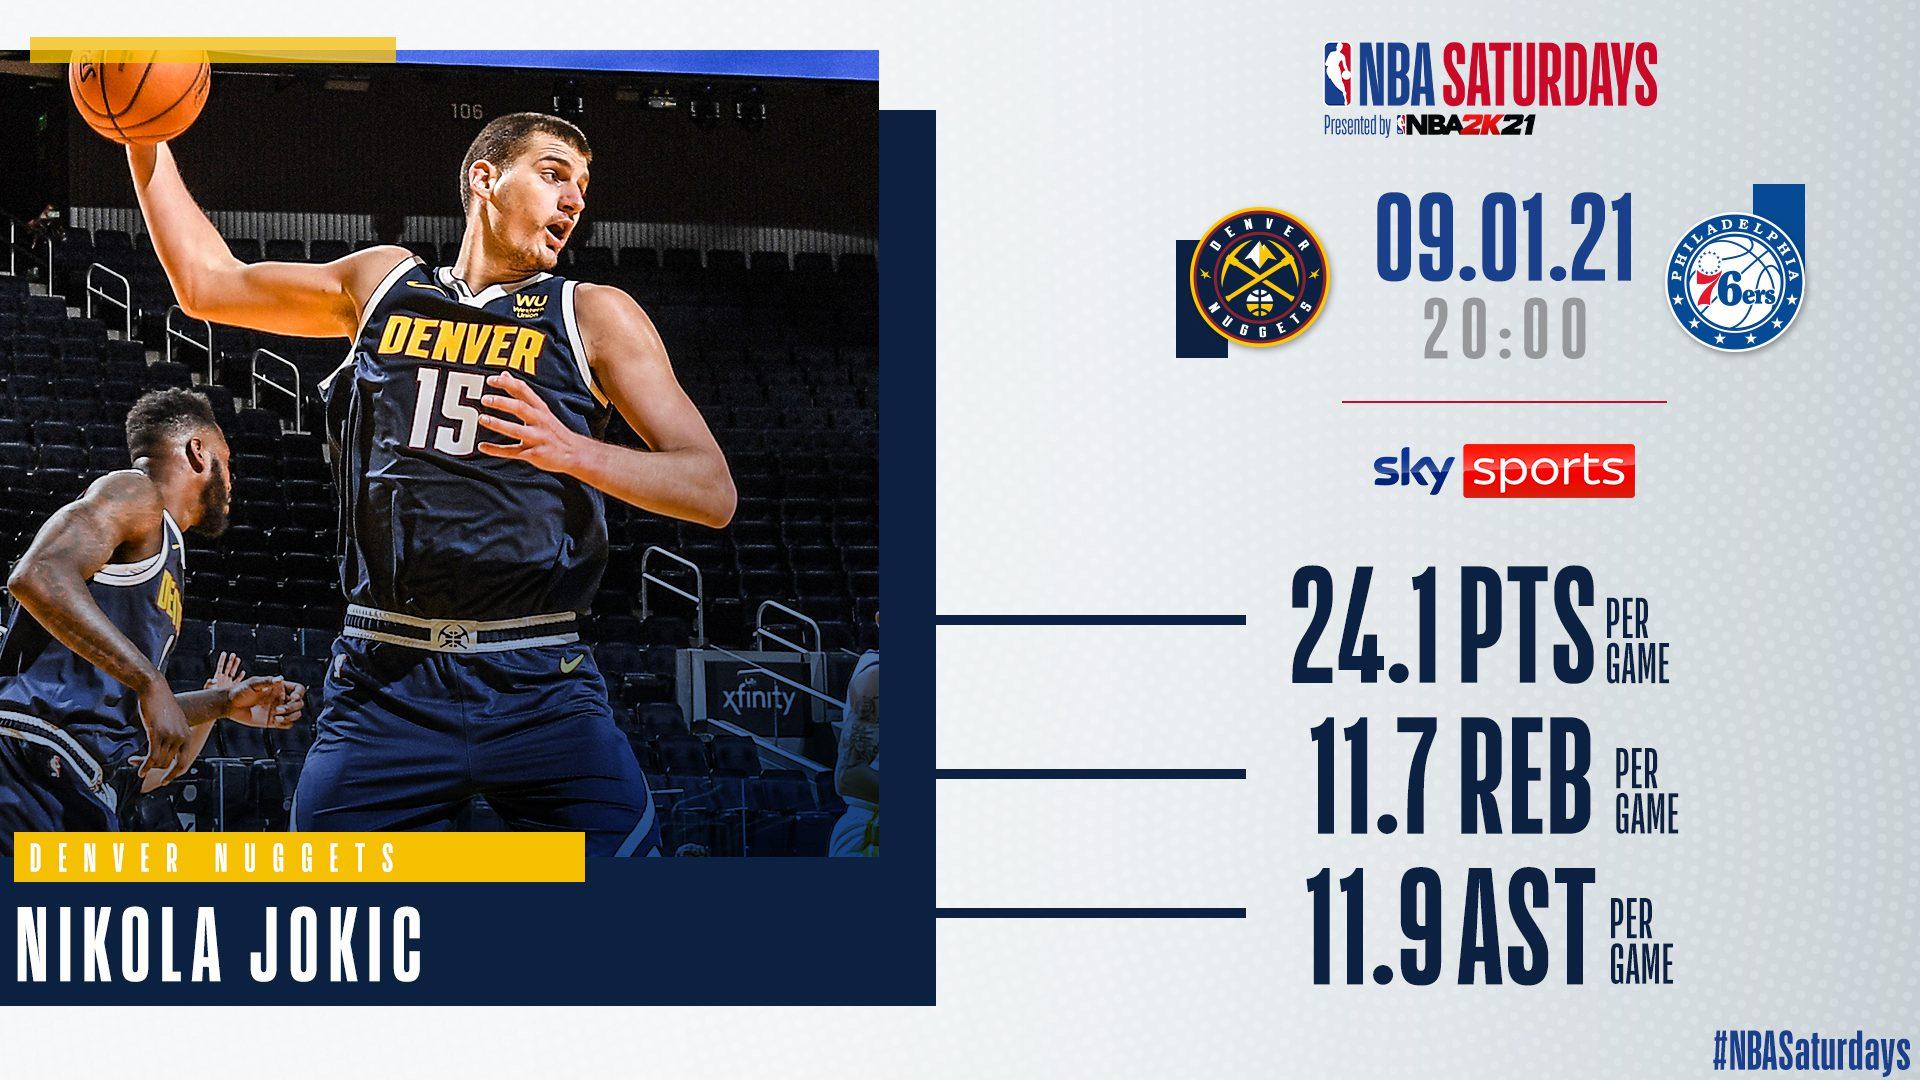 UK_DEN_NBA-SAT_Player-Stats_GW3_16x9